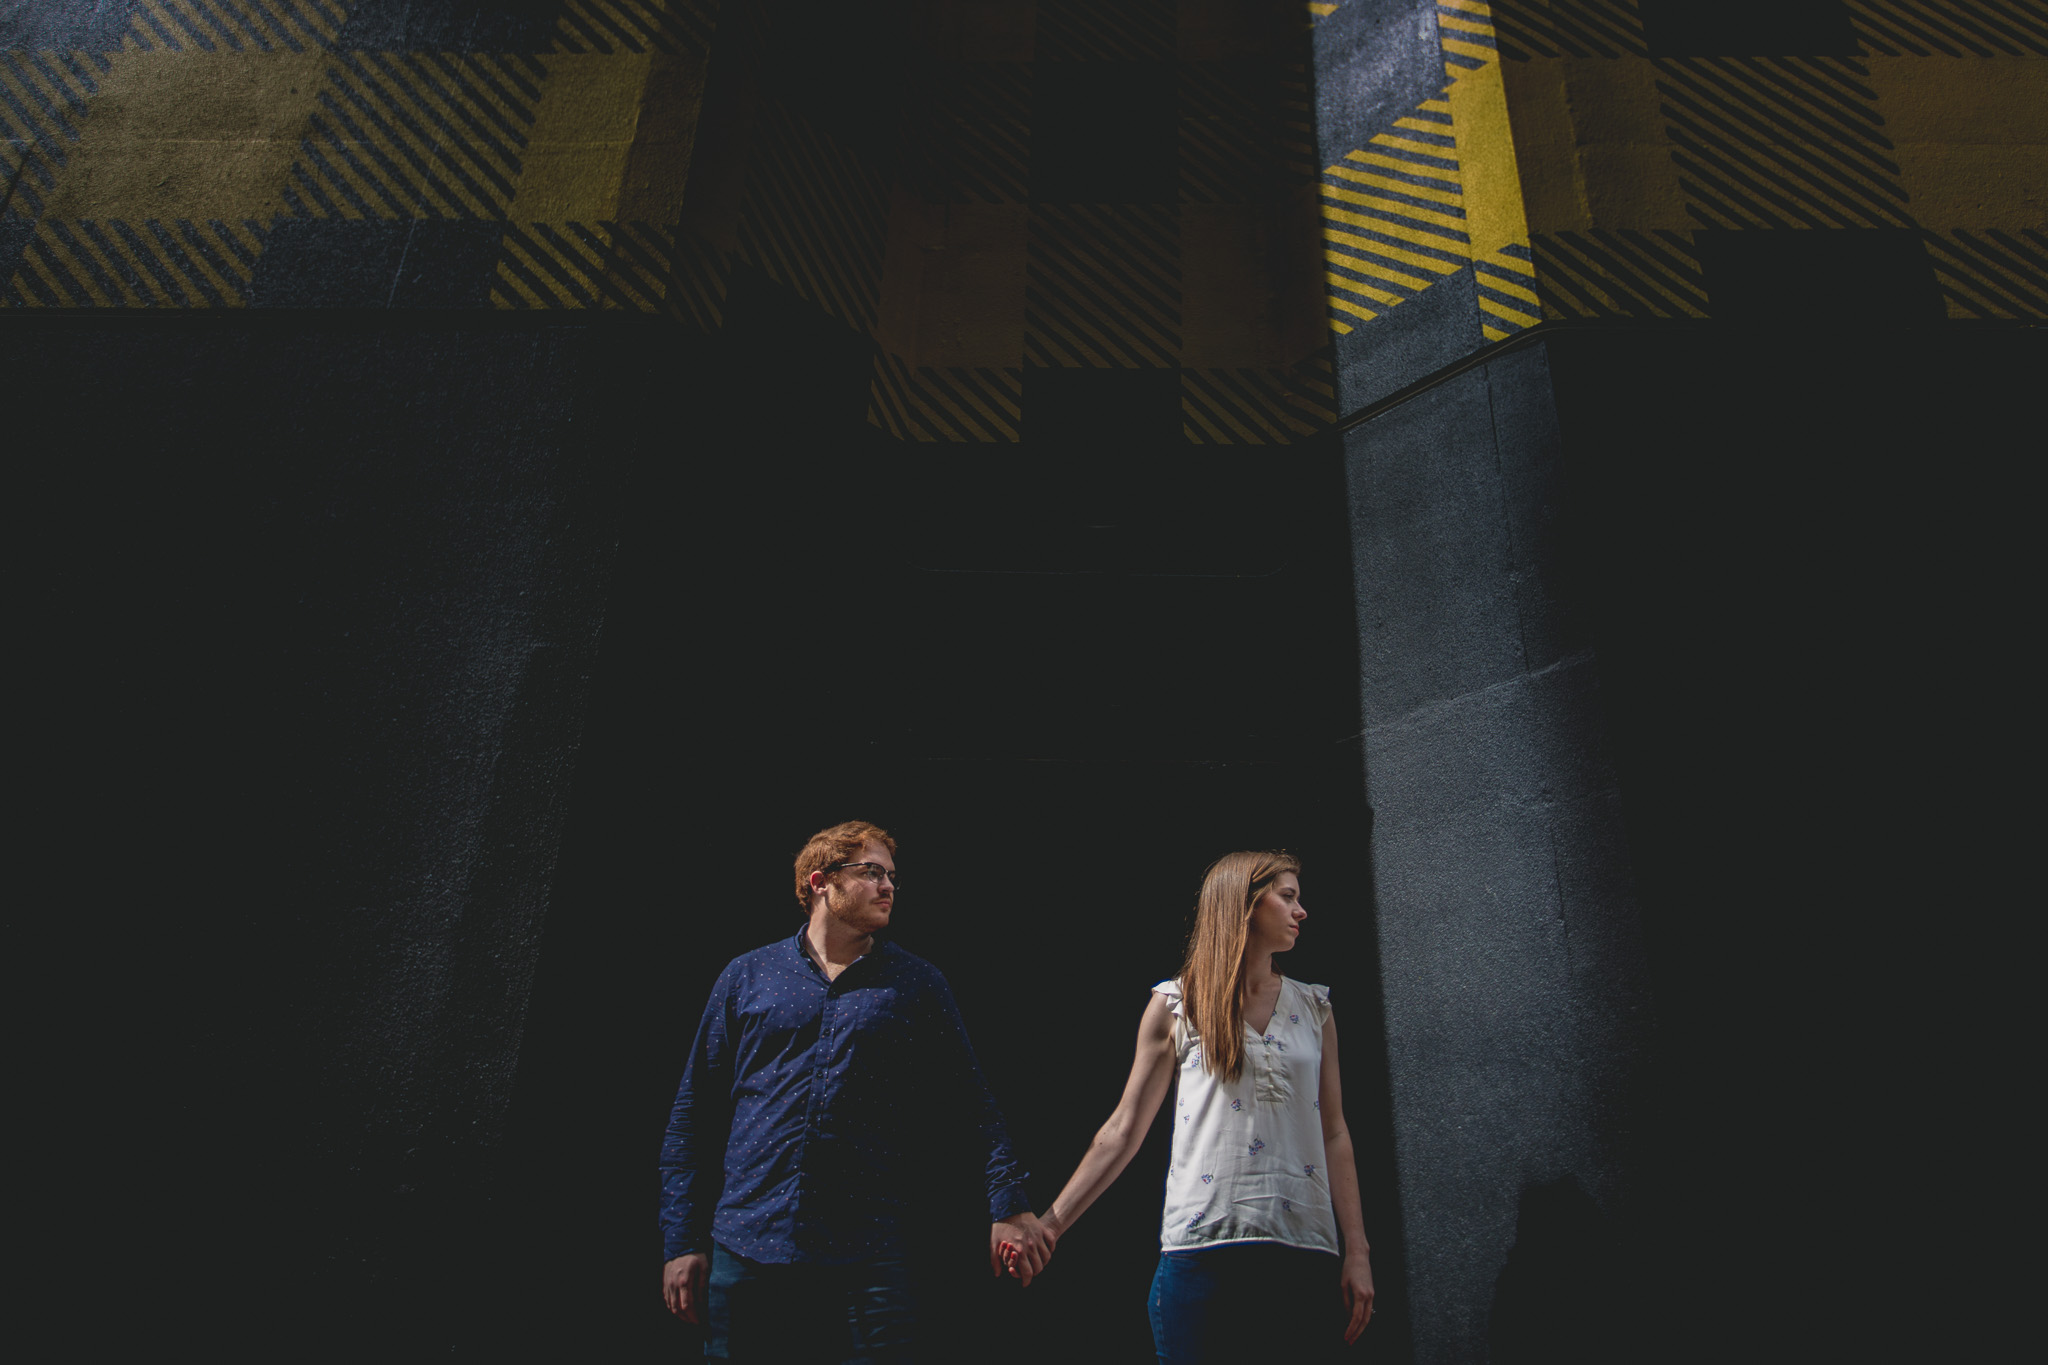 Engagement photographer in Iowa